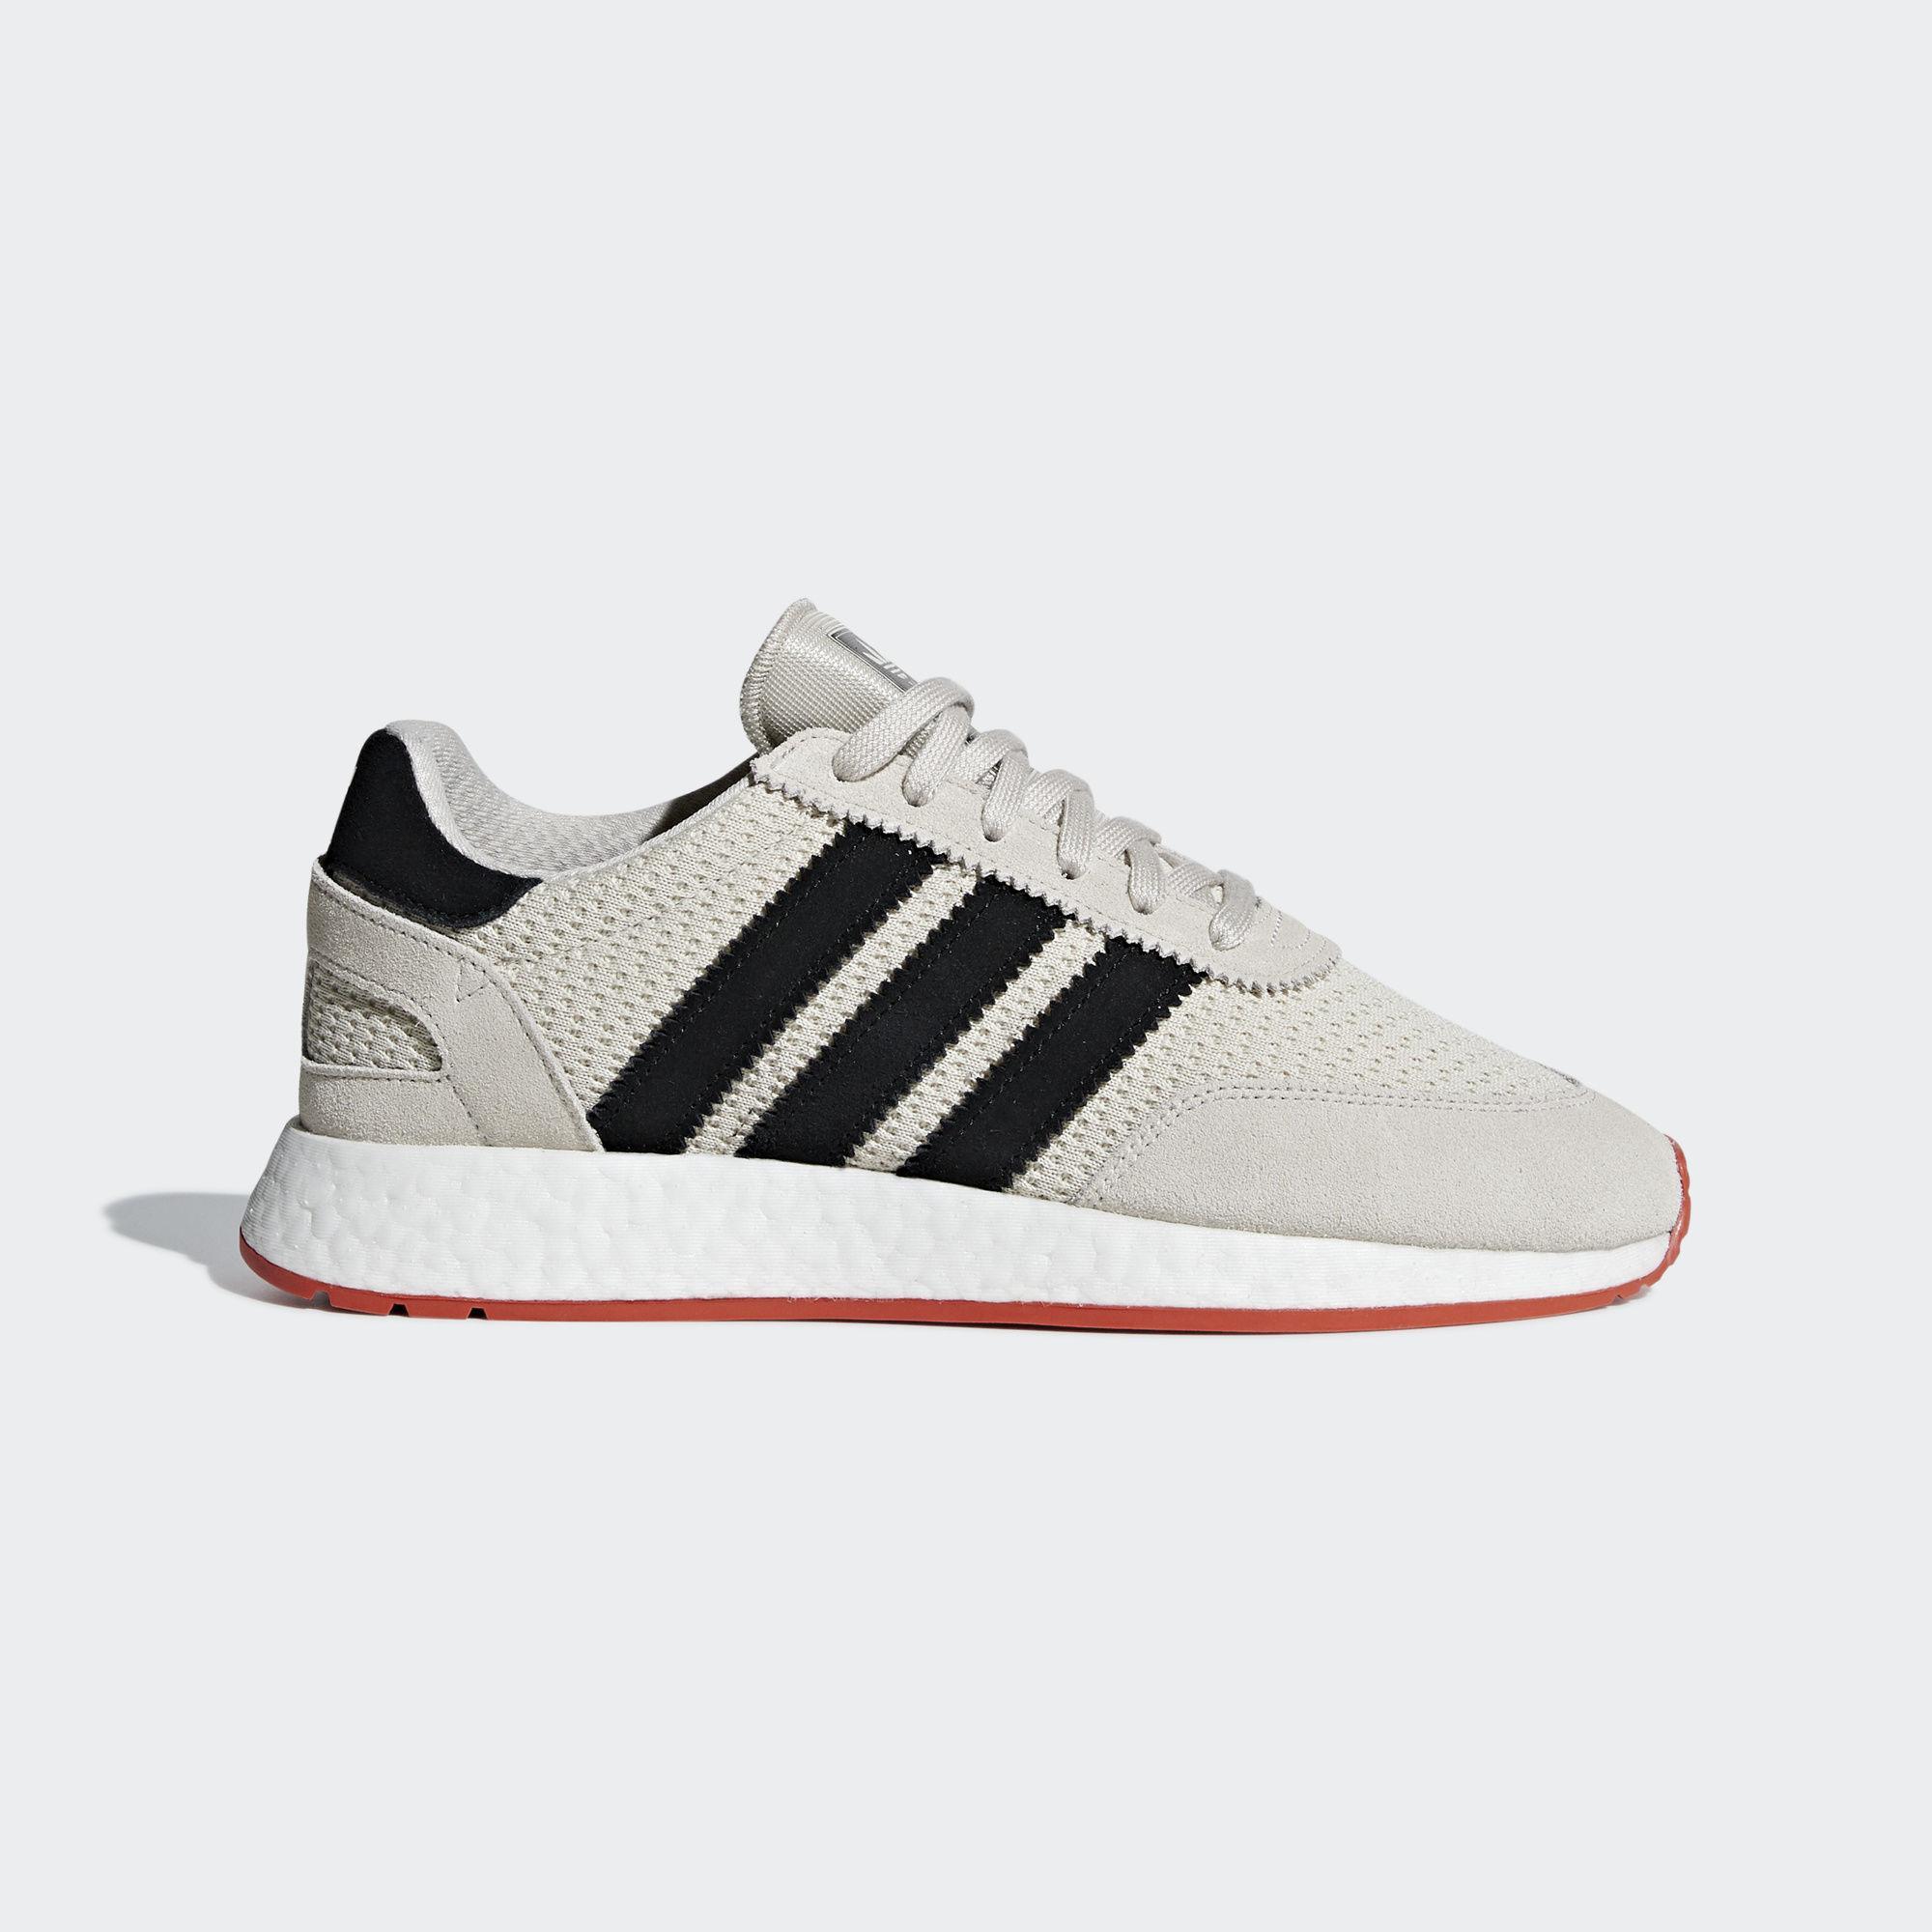 online retailer 16126 66bd3 adidas. Men s I-5923 Shoes